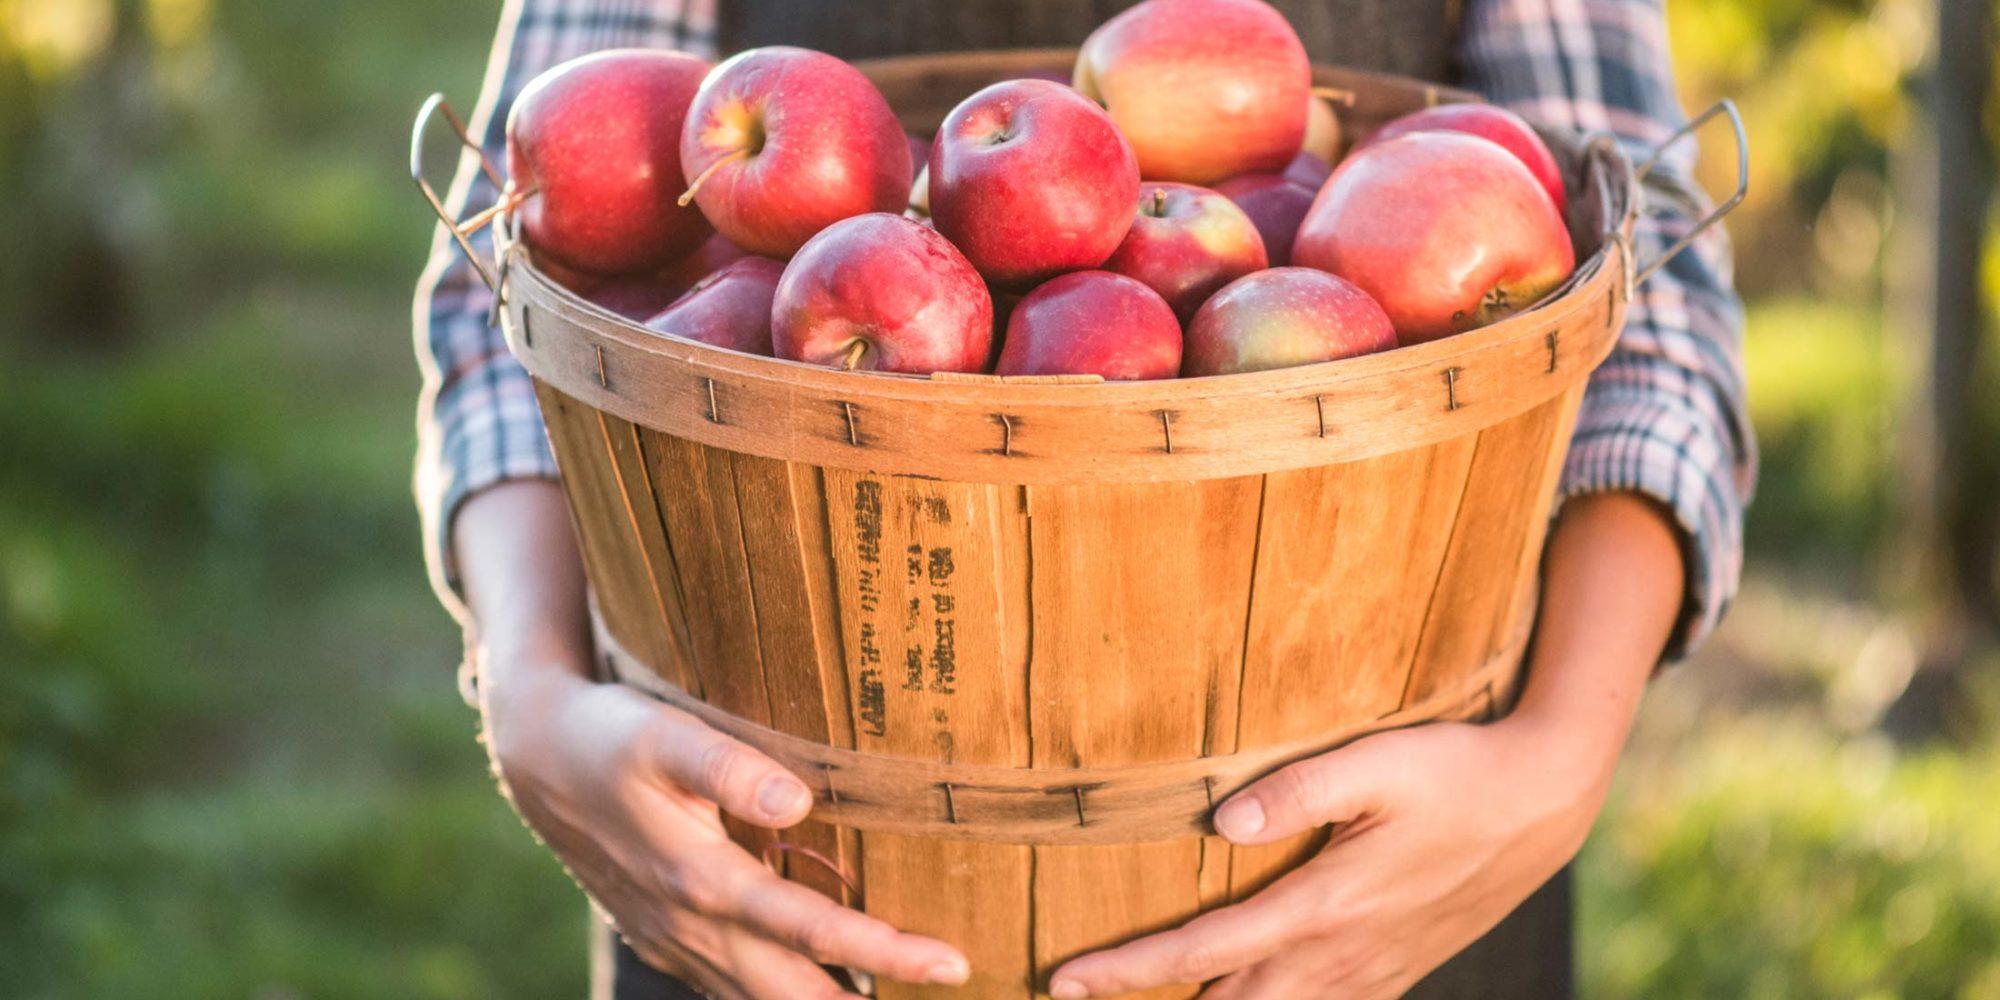 Image of apples in basket